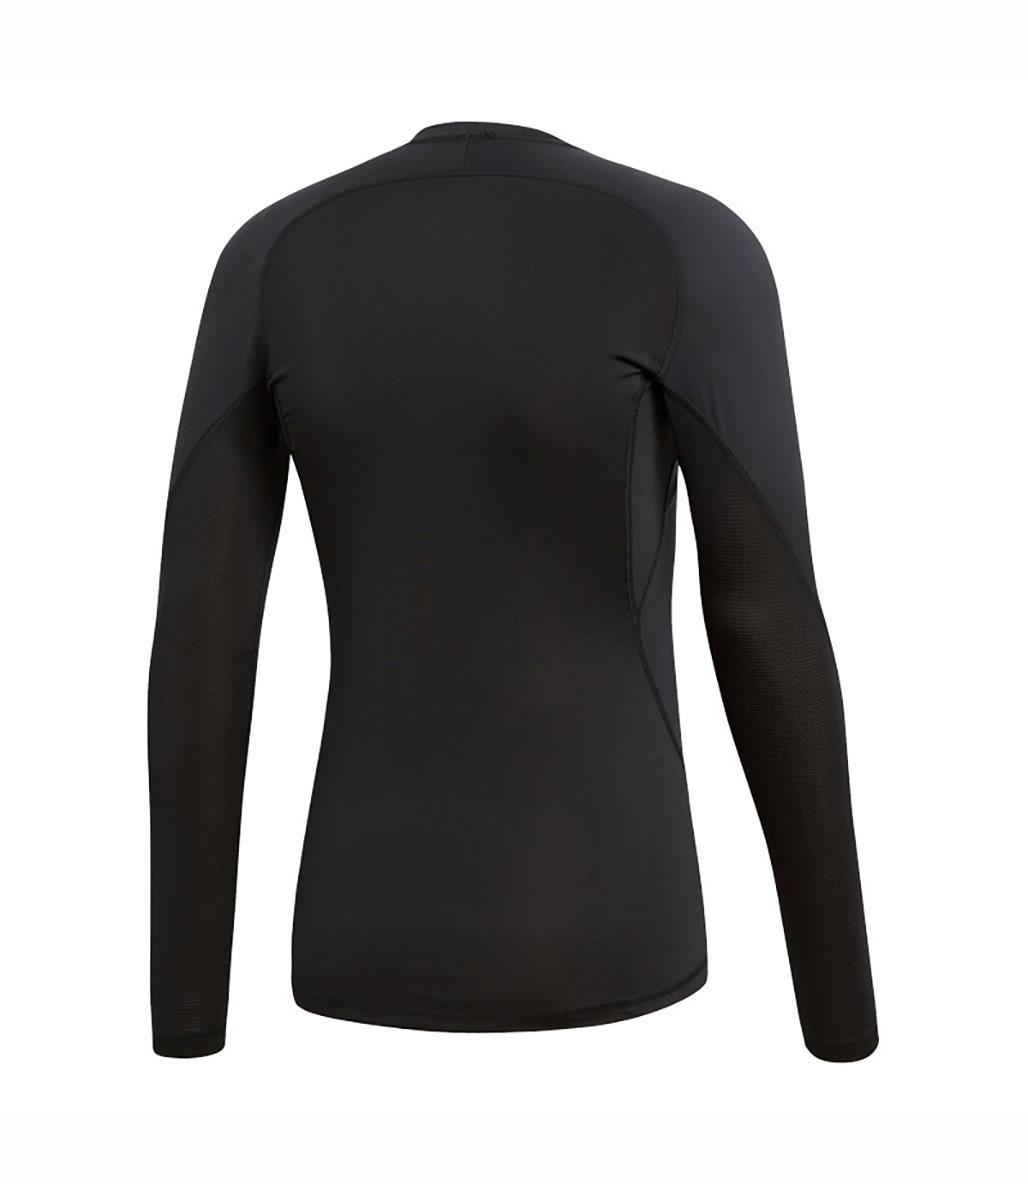 Adidas Alphaskin Sport Uzun Kollu T-Shirt Siyah